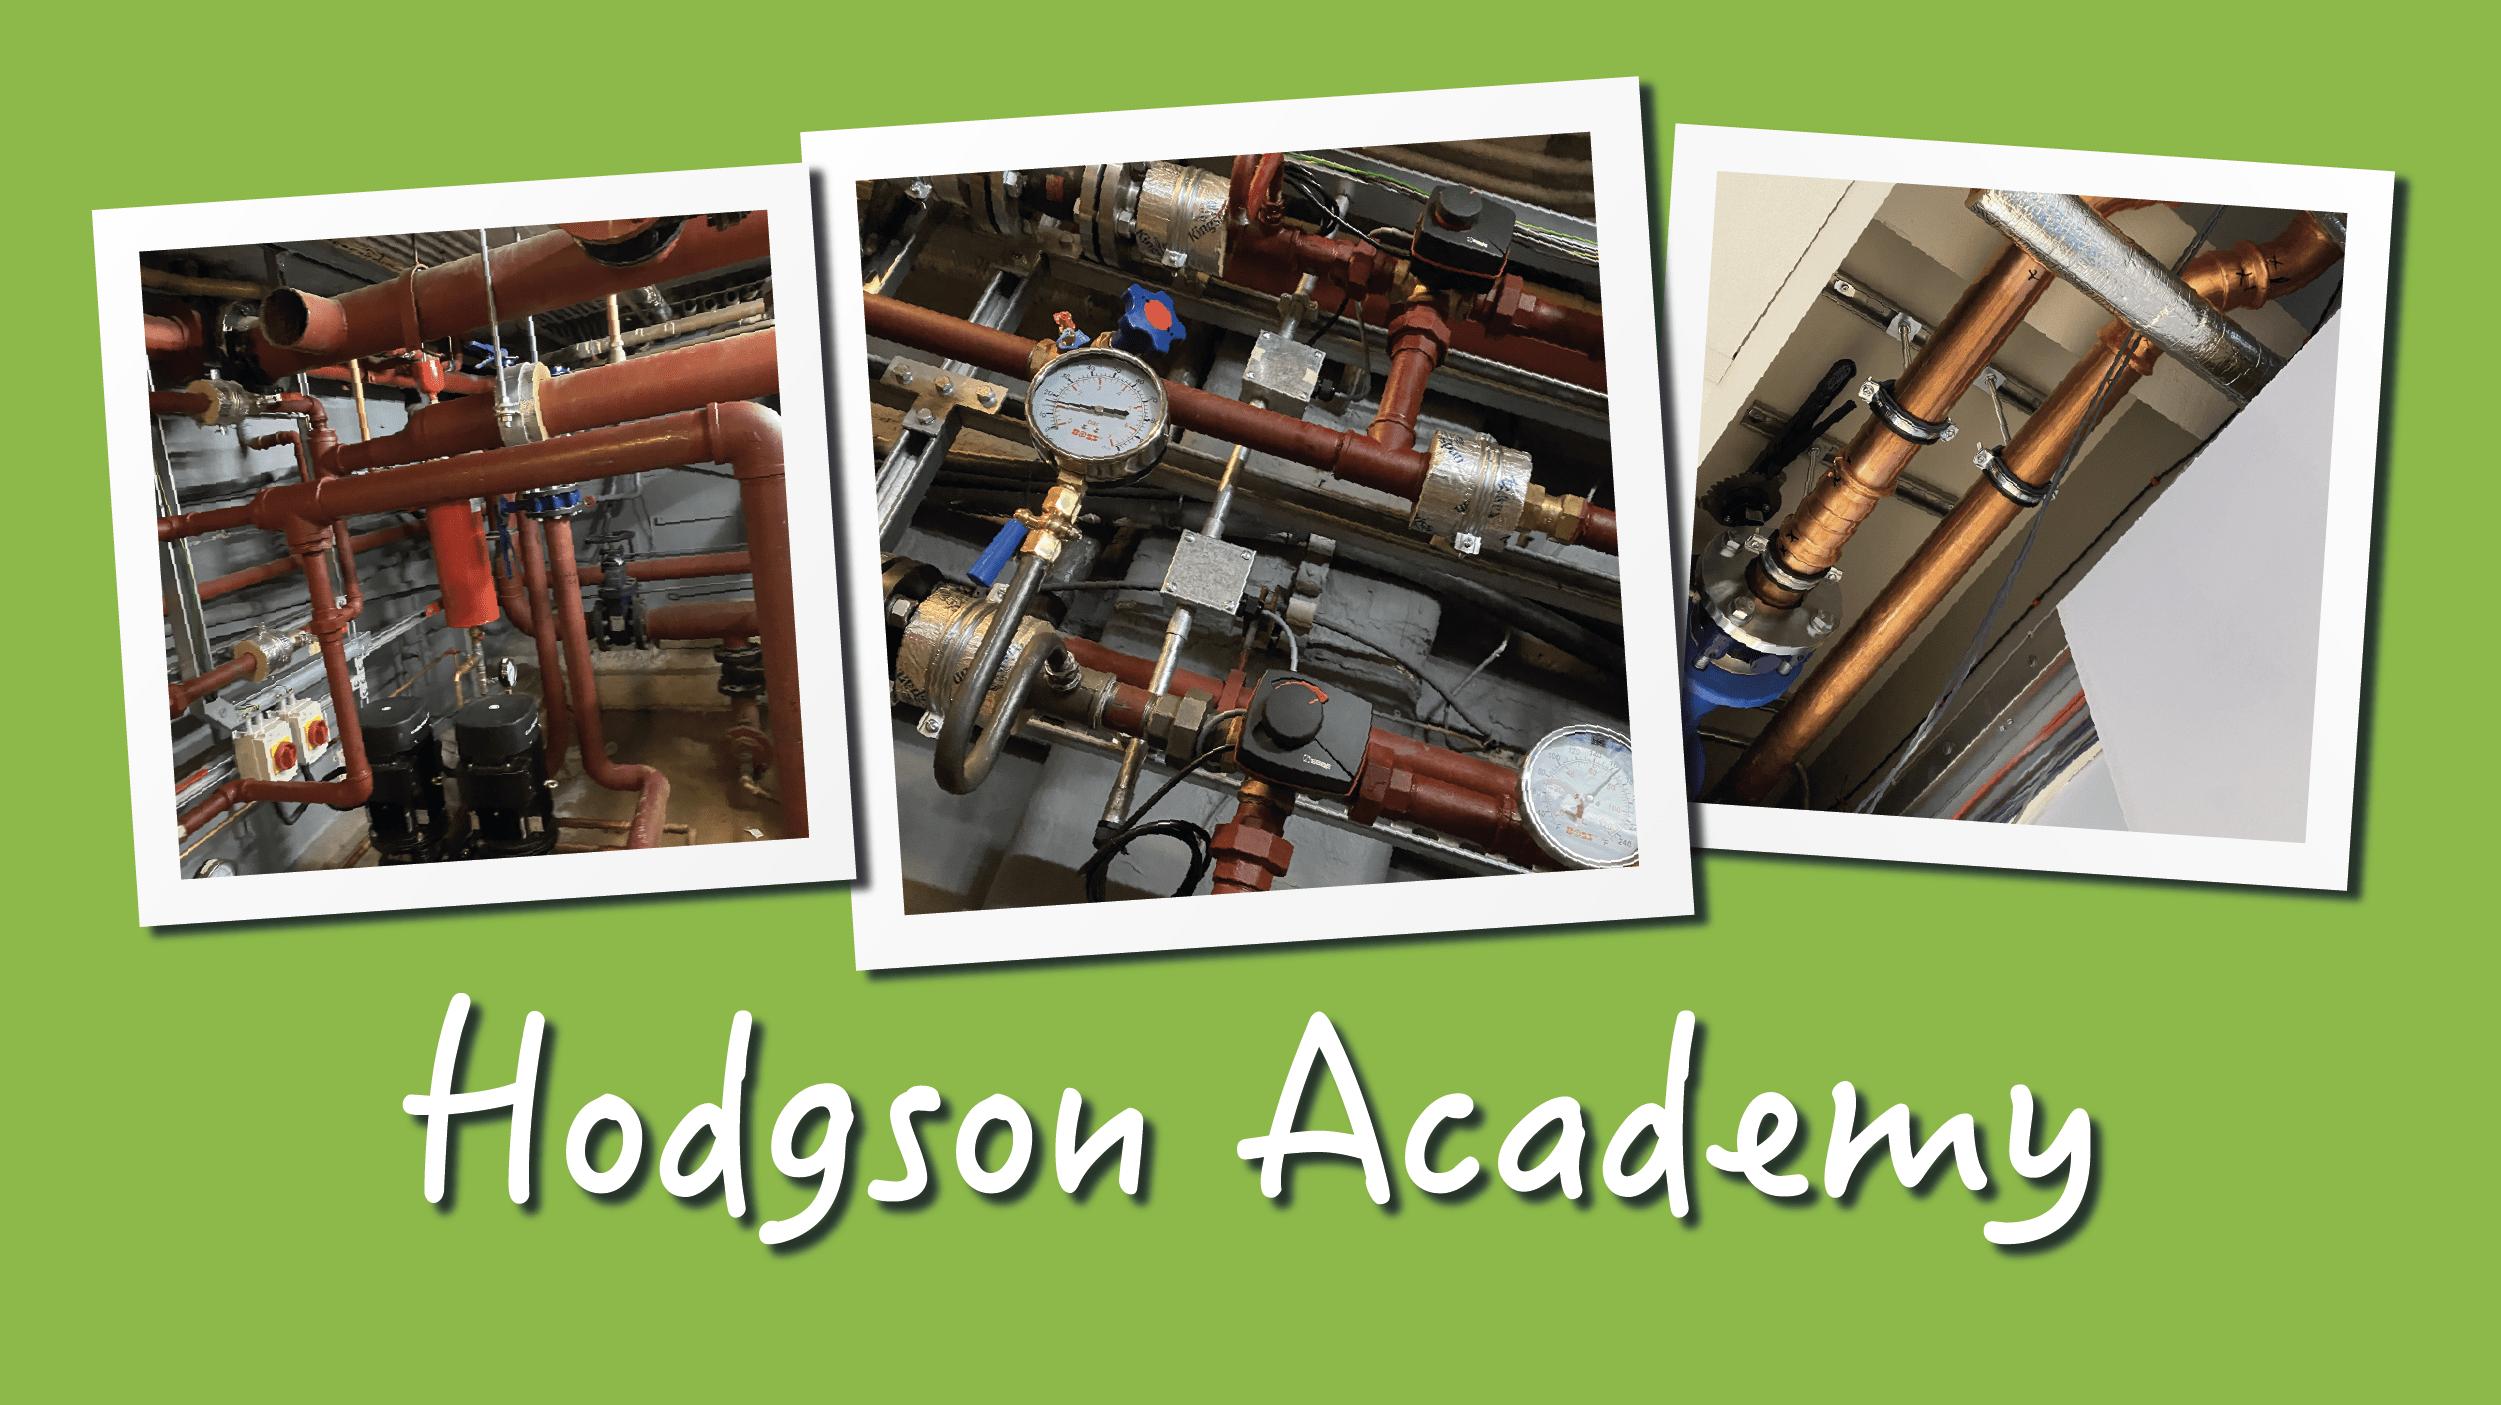 Hodgson Academy Poulton-le-Fylde